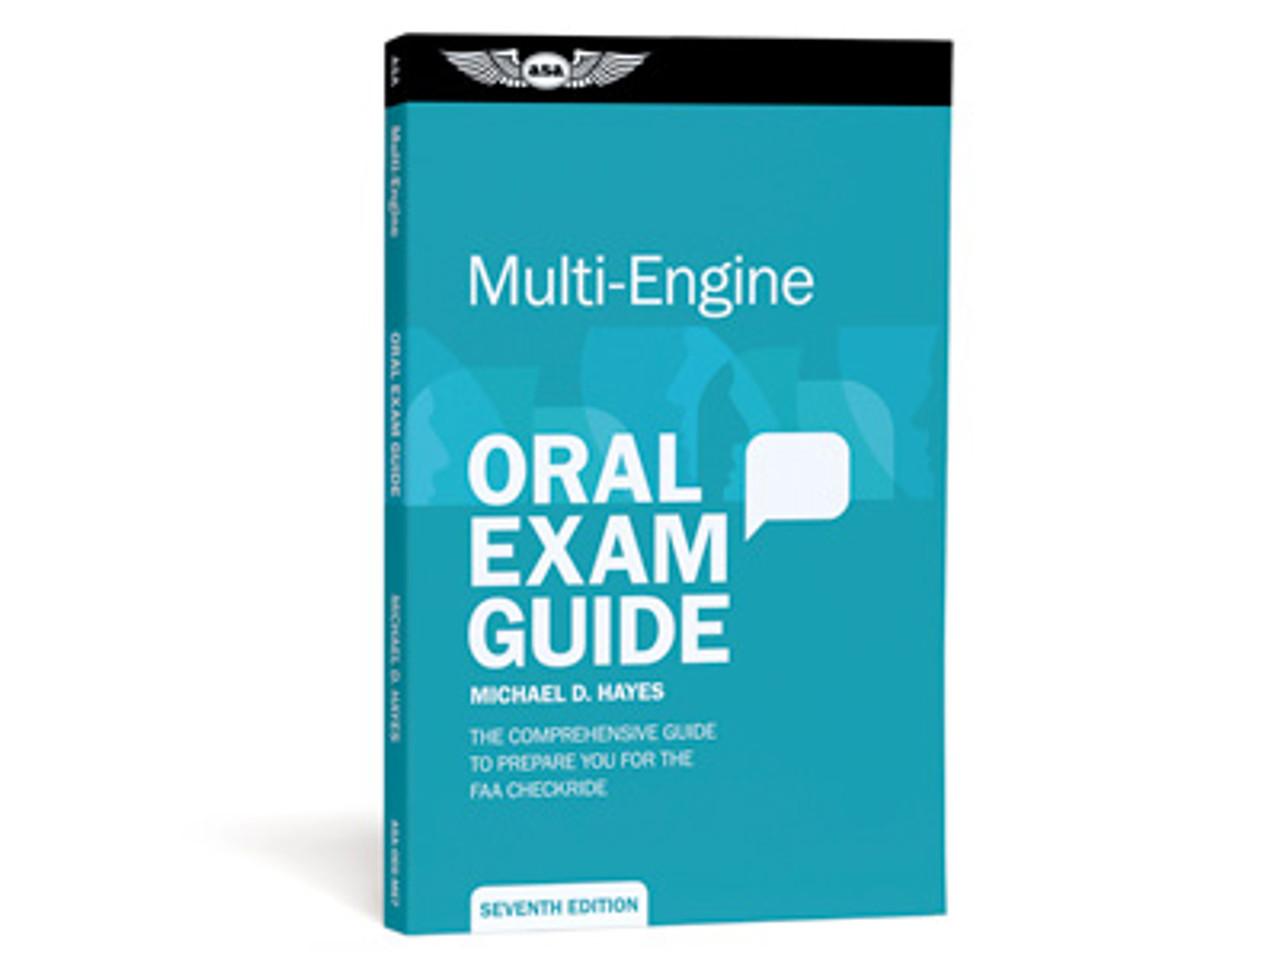 ASA Oral Exam Guide: Multi-Engine